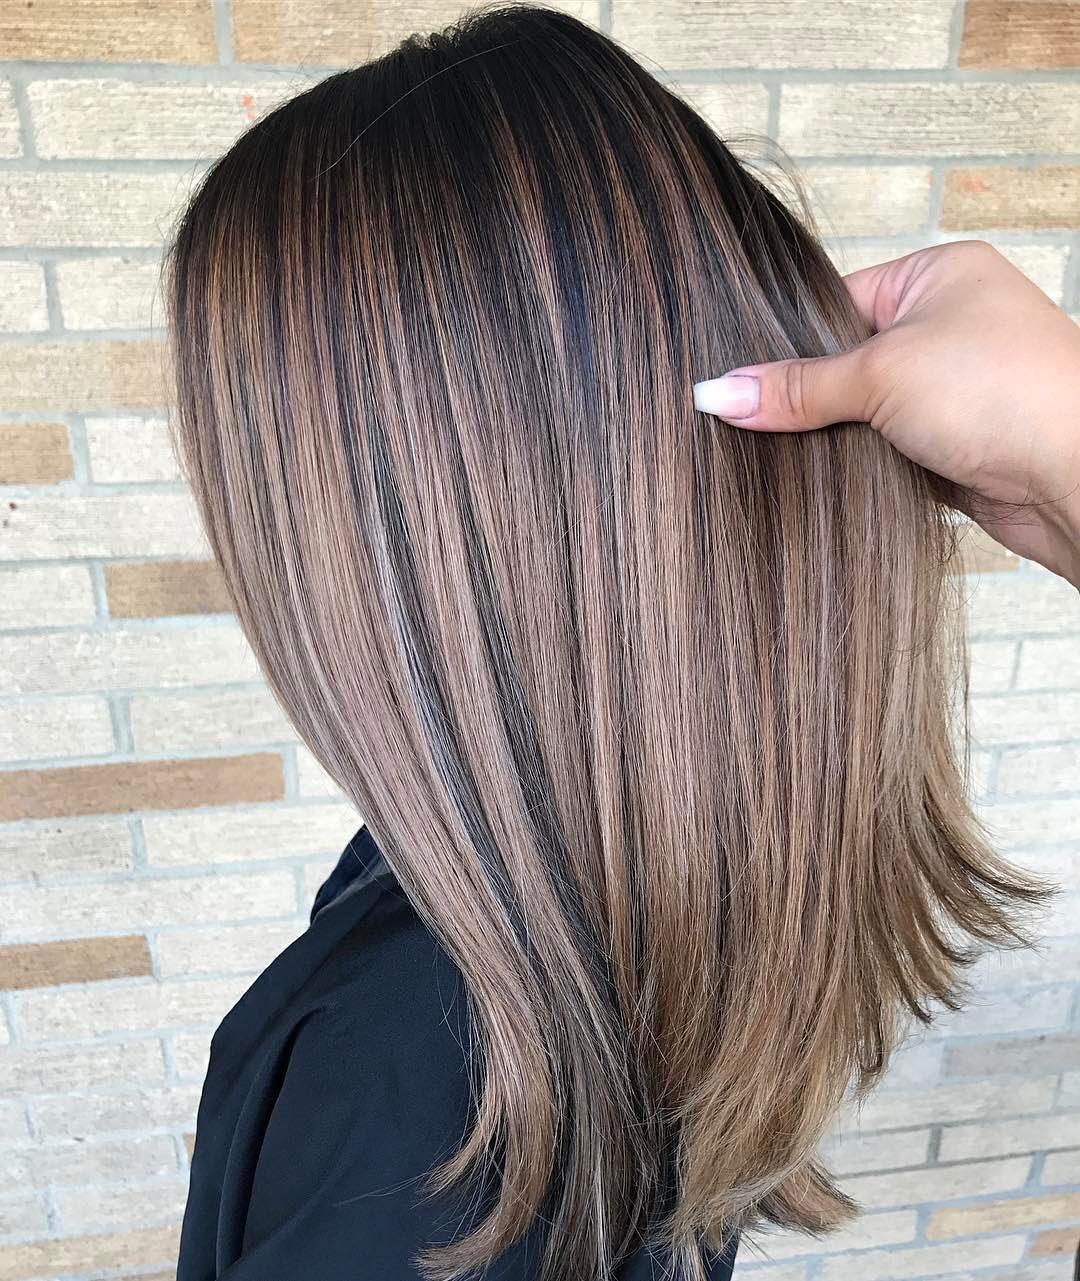 Medium Length Brown Hair - Hairstyle Men